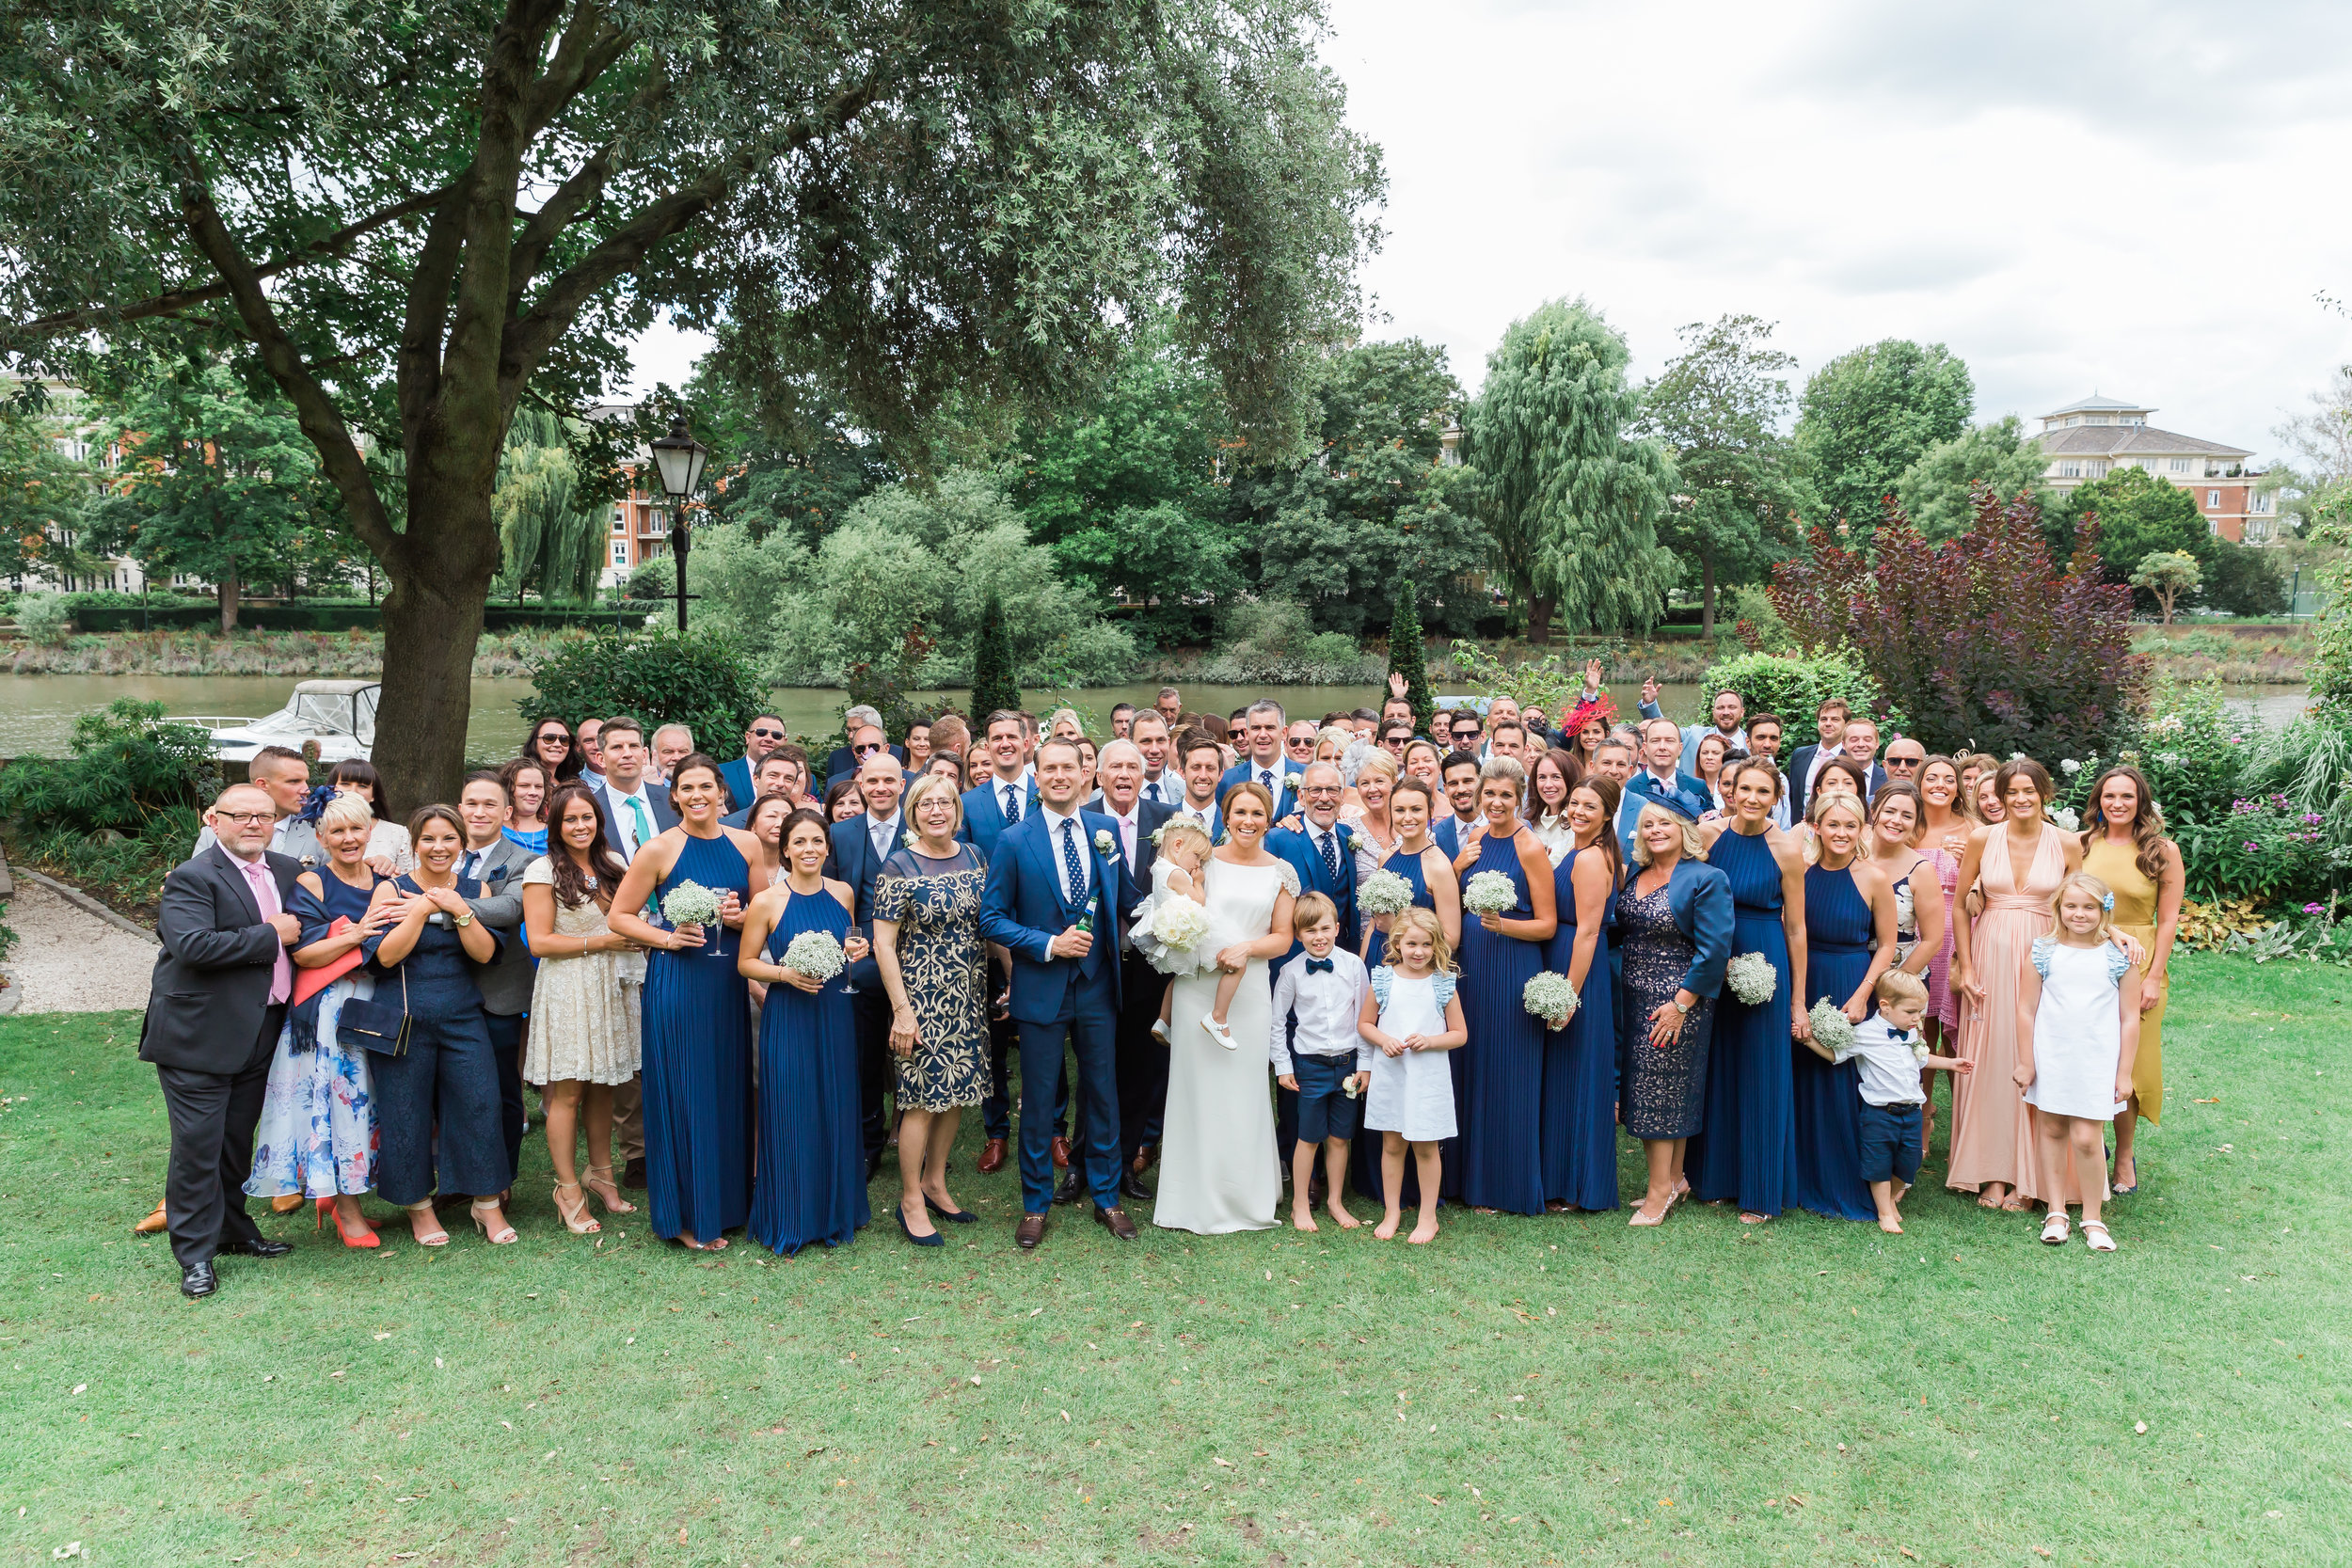 family group photo at wedding.jpg